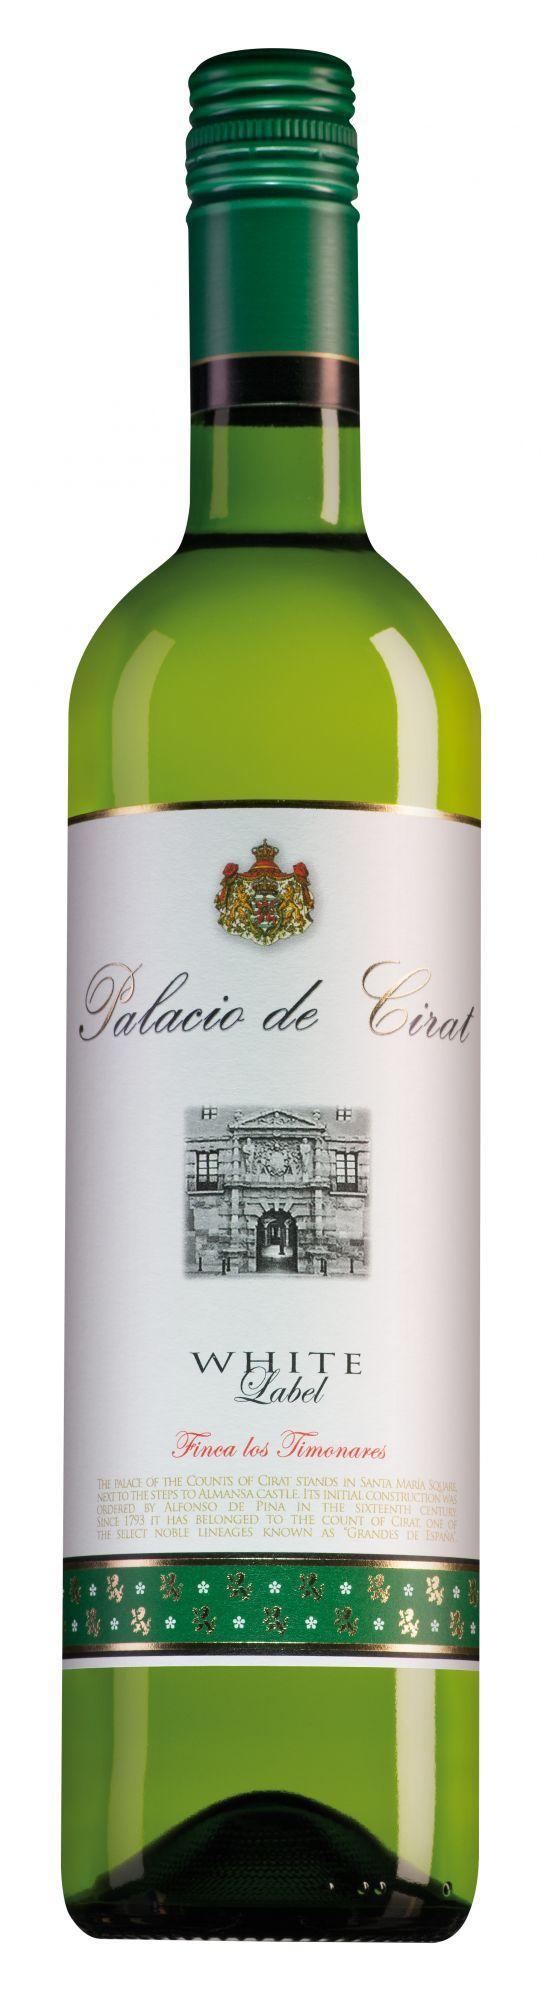 Palacio de Cirat Almansa White Label Verdejo-Sauvignon Blanc